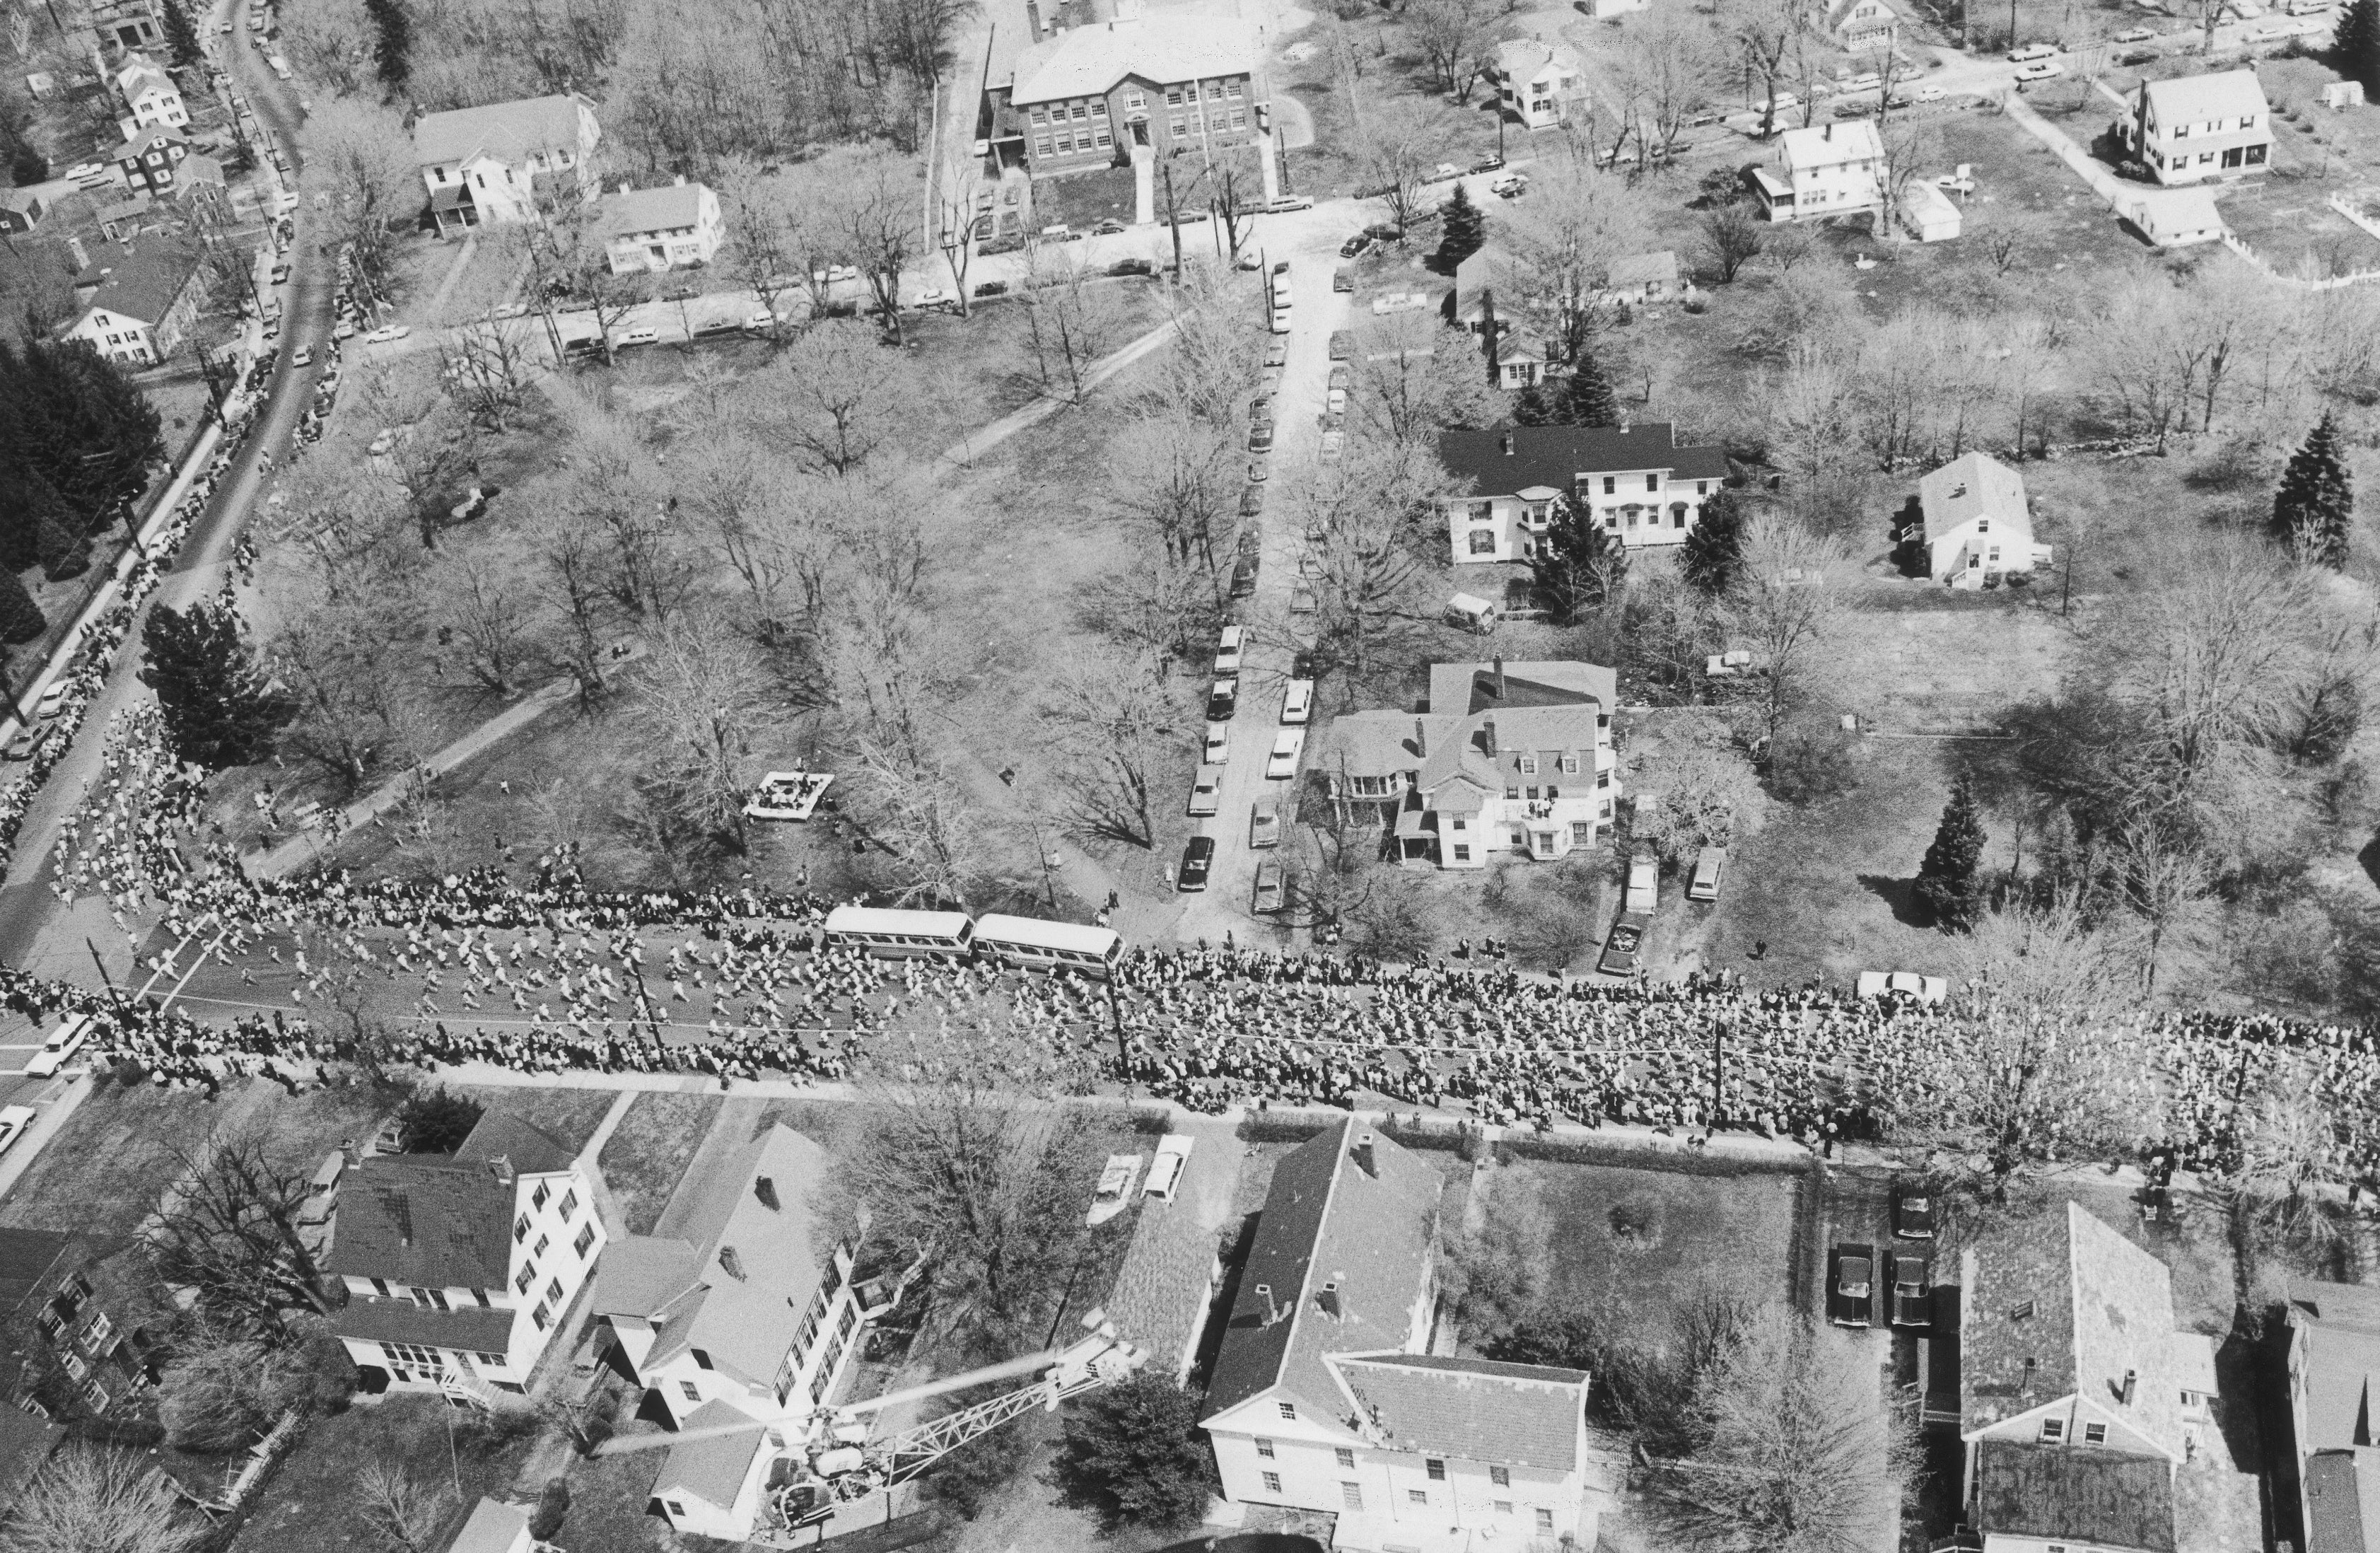 1968 Boston Marathon